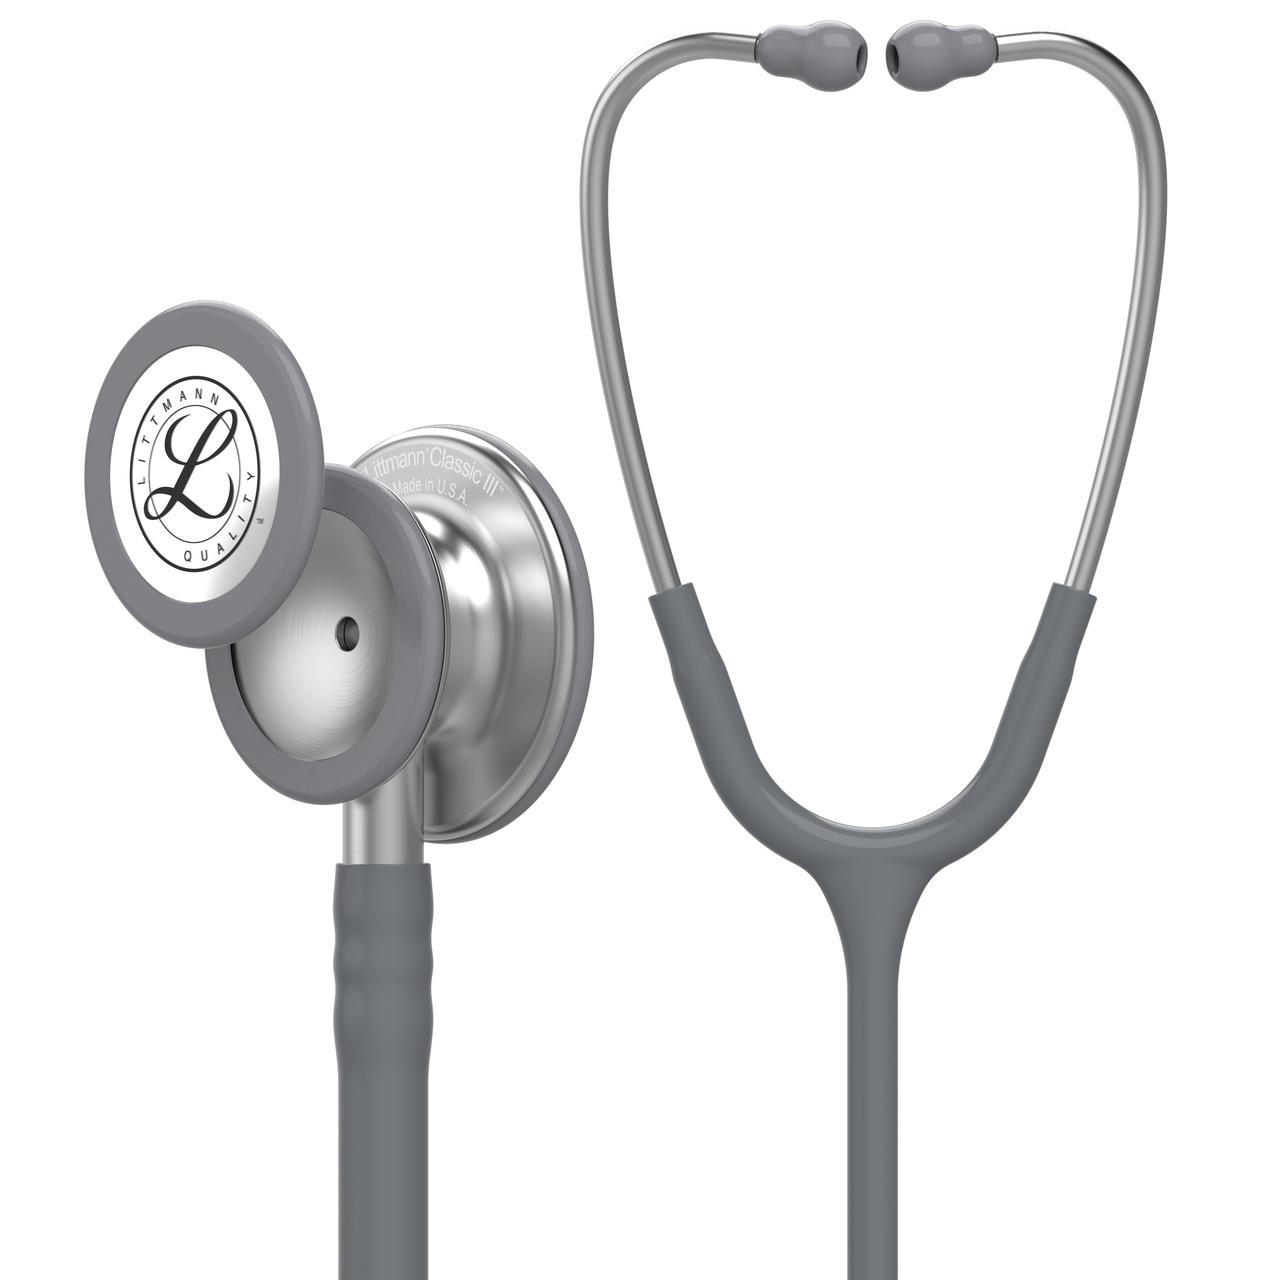 Littmann Classic III Stethoscope, Gray, 5621